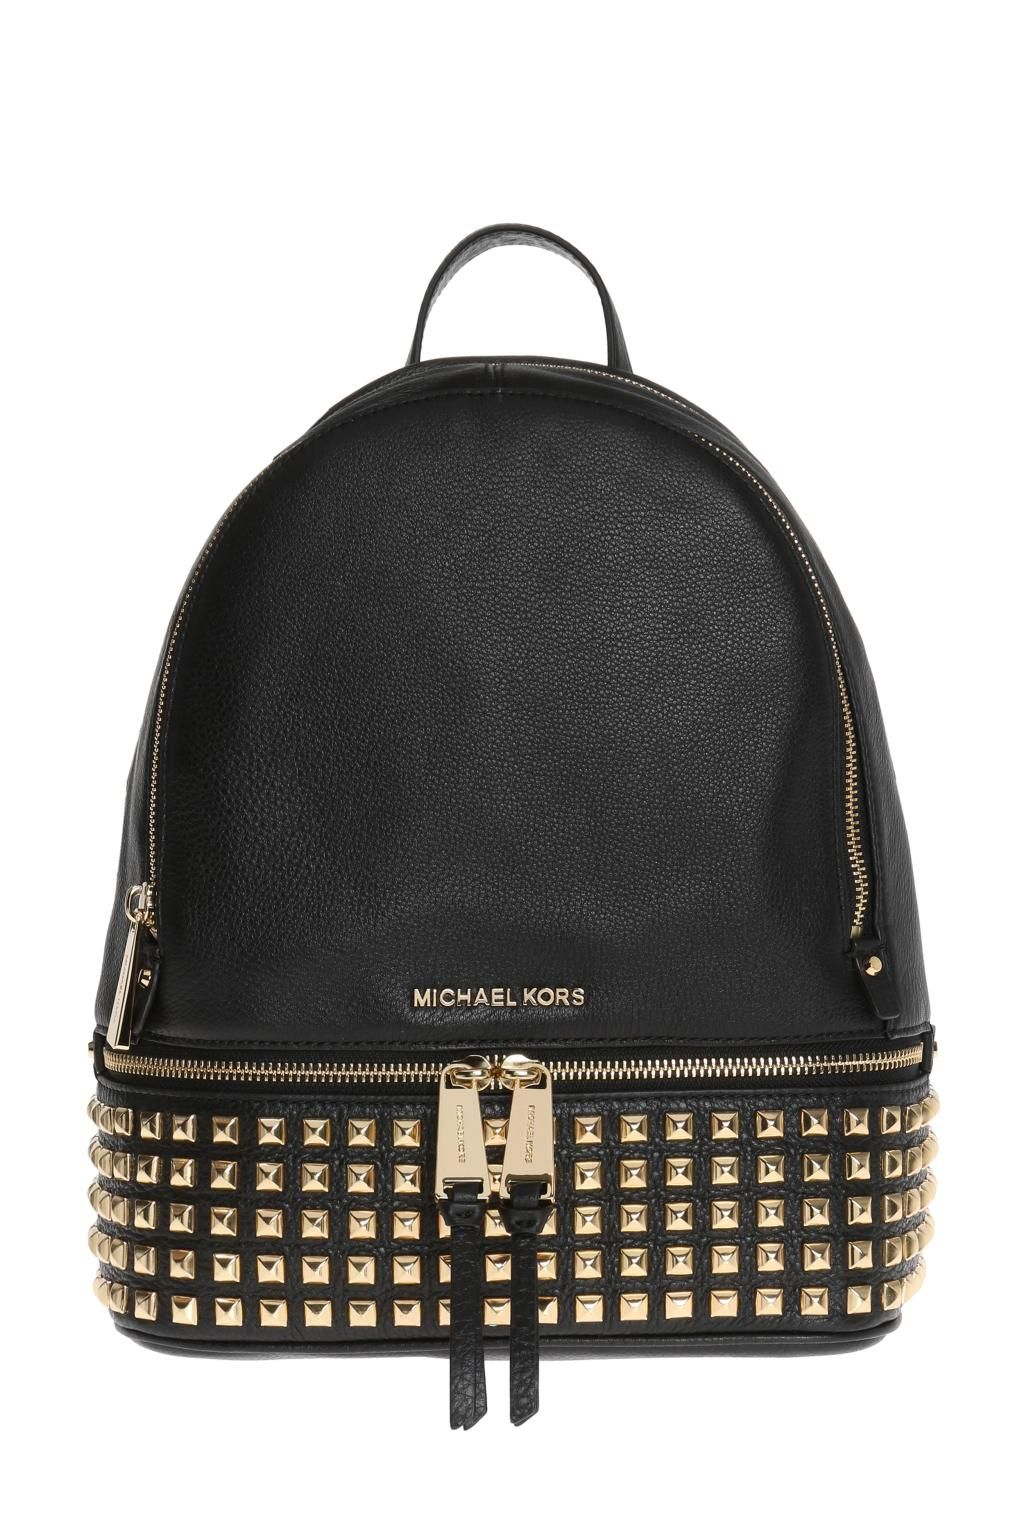 7189180bc2 Michael Michael Kors Women's 30S5Gezb5L001 Black Leather Backpack ...